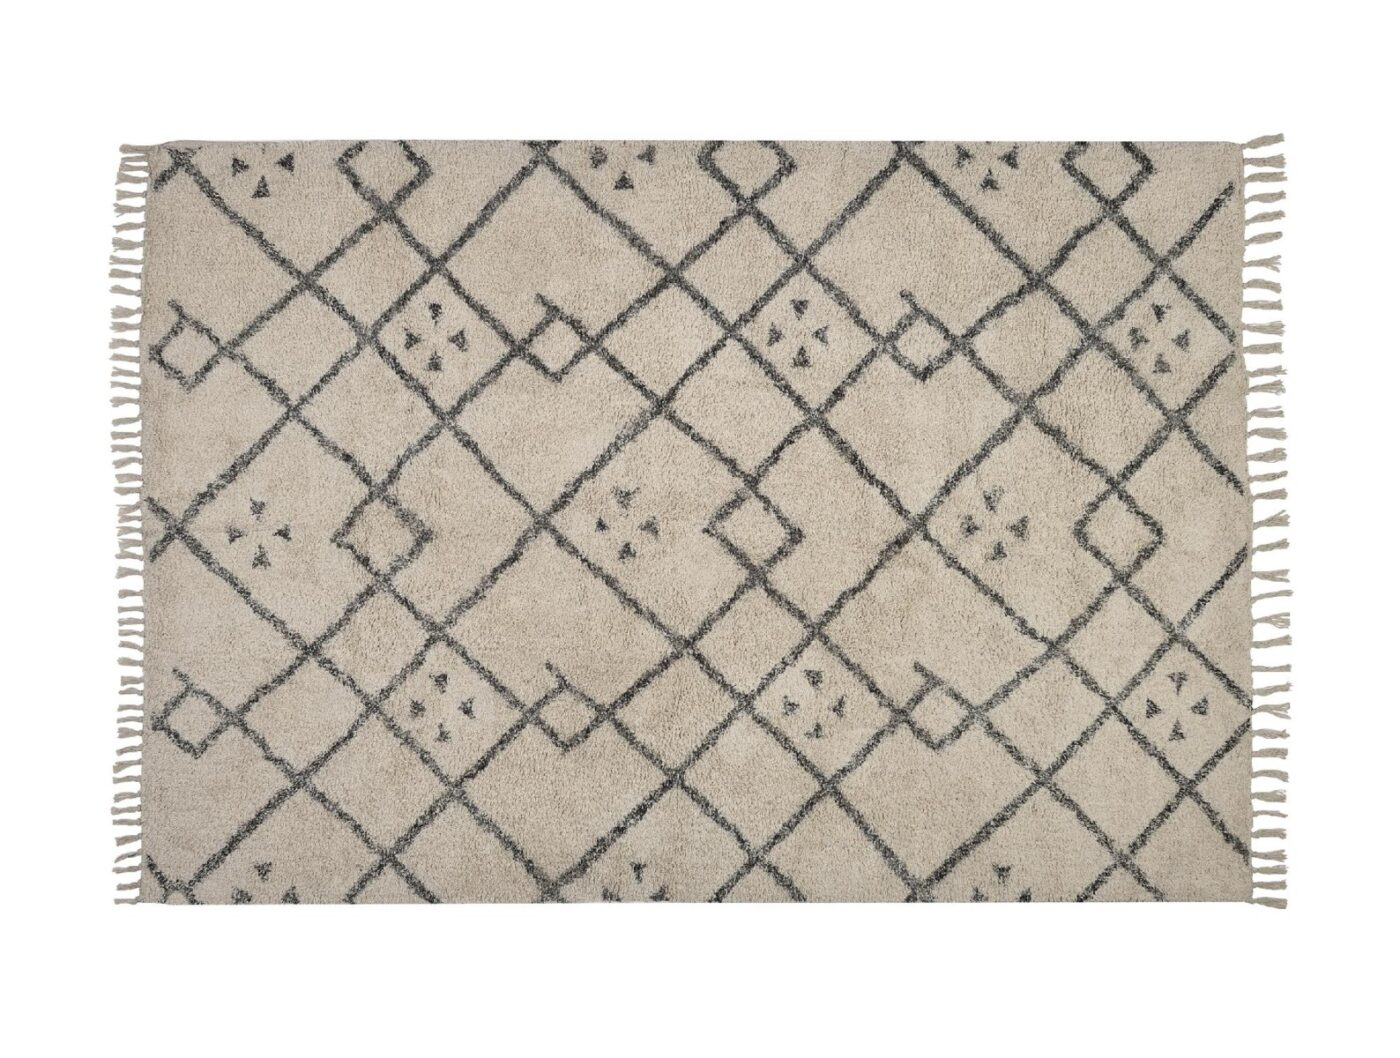 Betz 2 Unidades alfombras de ba/ño tama/ño 50x70cm 100/% Algodon alfombriila ba/ño Serie Premium Calidad 650 g//m/² Disponible en 10 Colores Color Azul